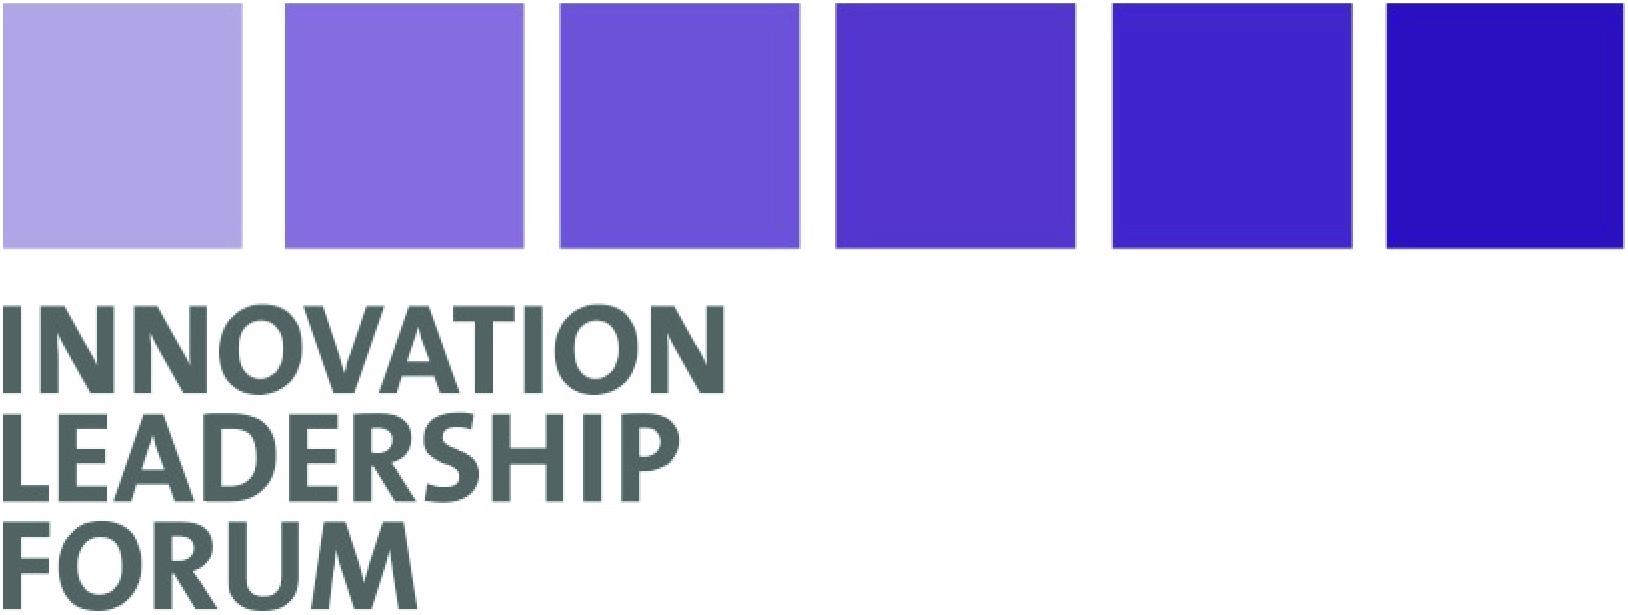 Innovation Leadership Forum